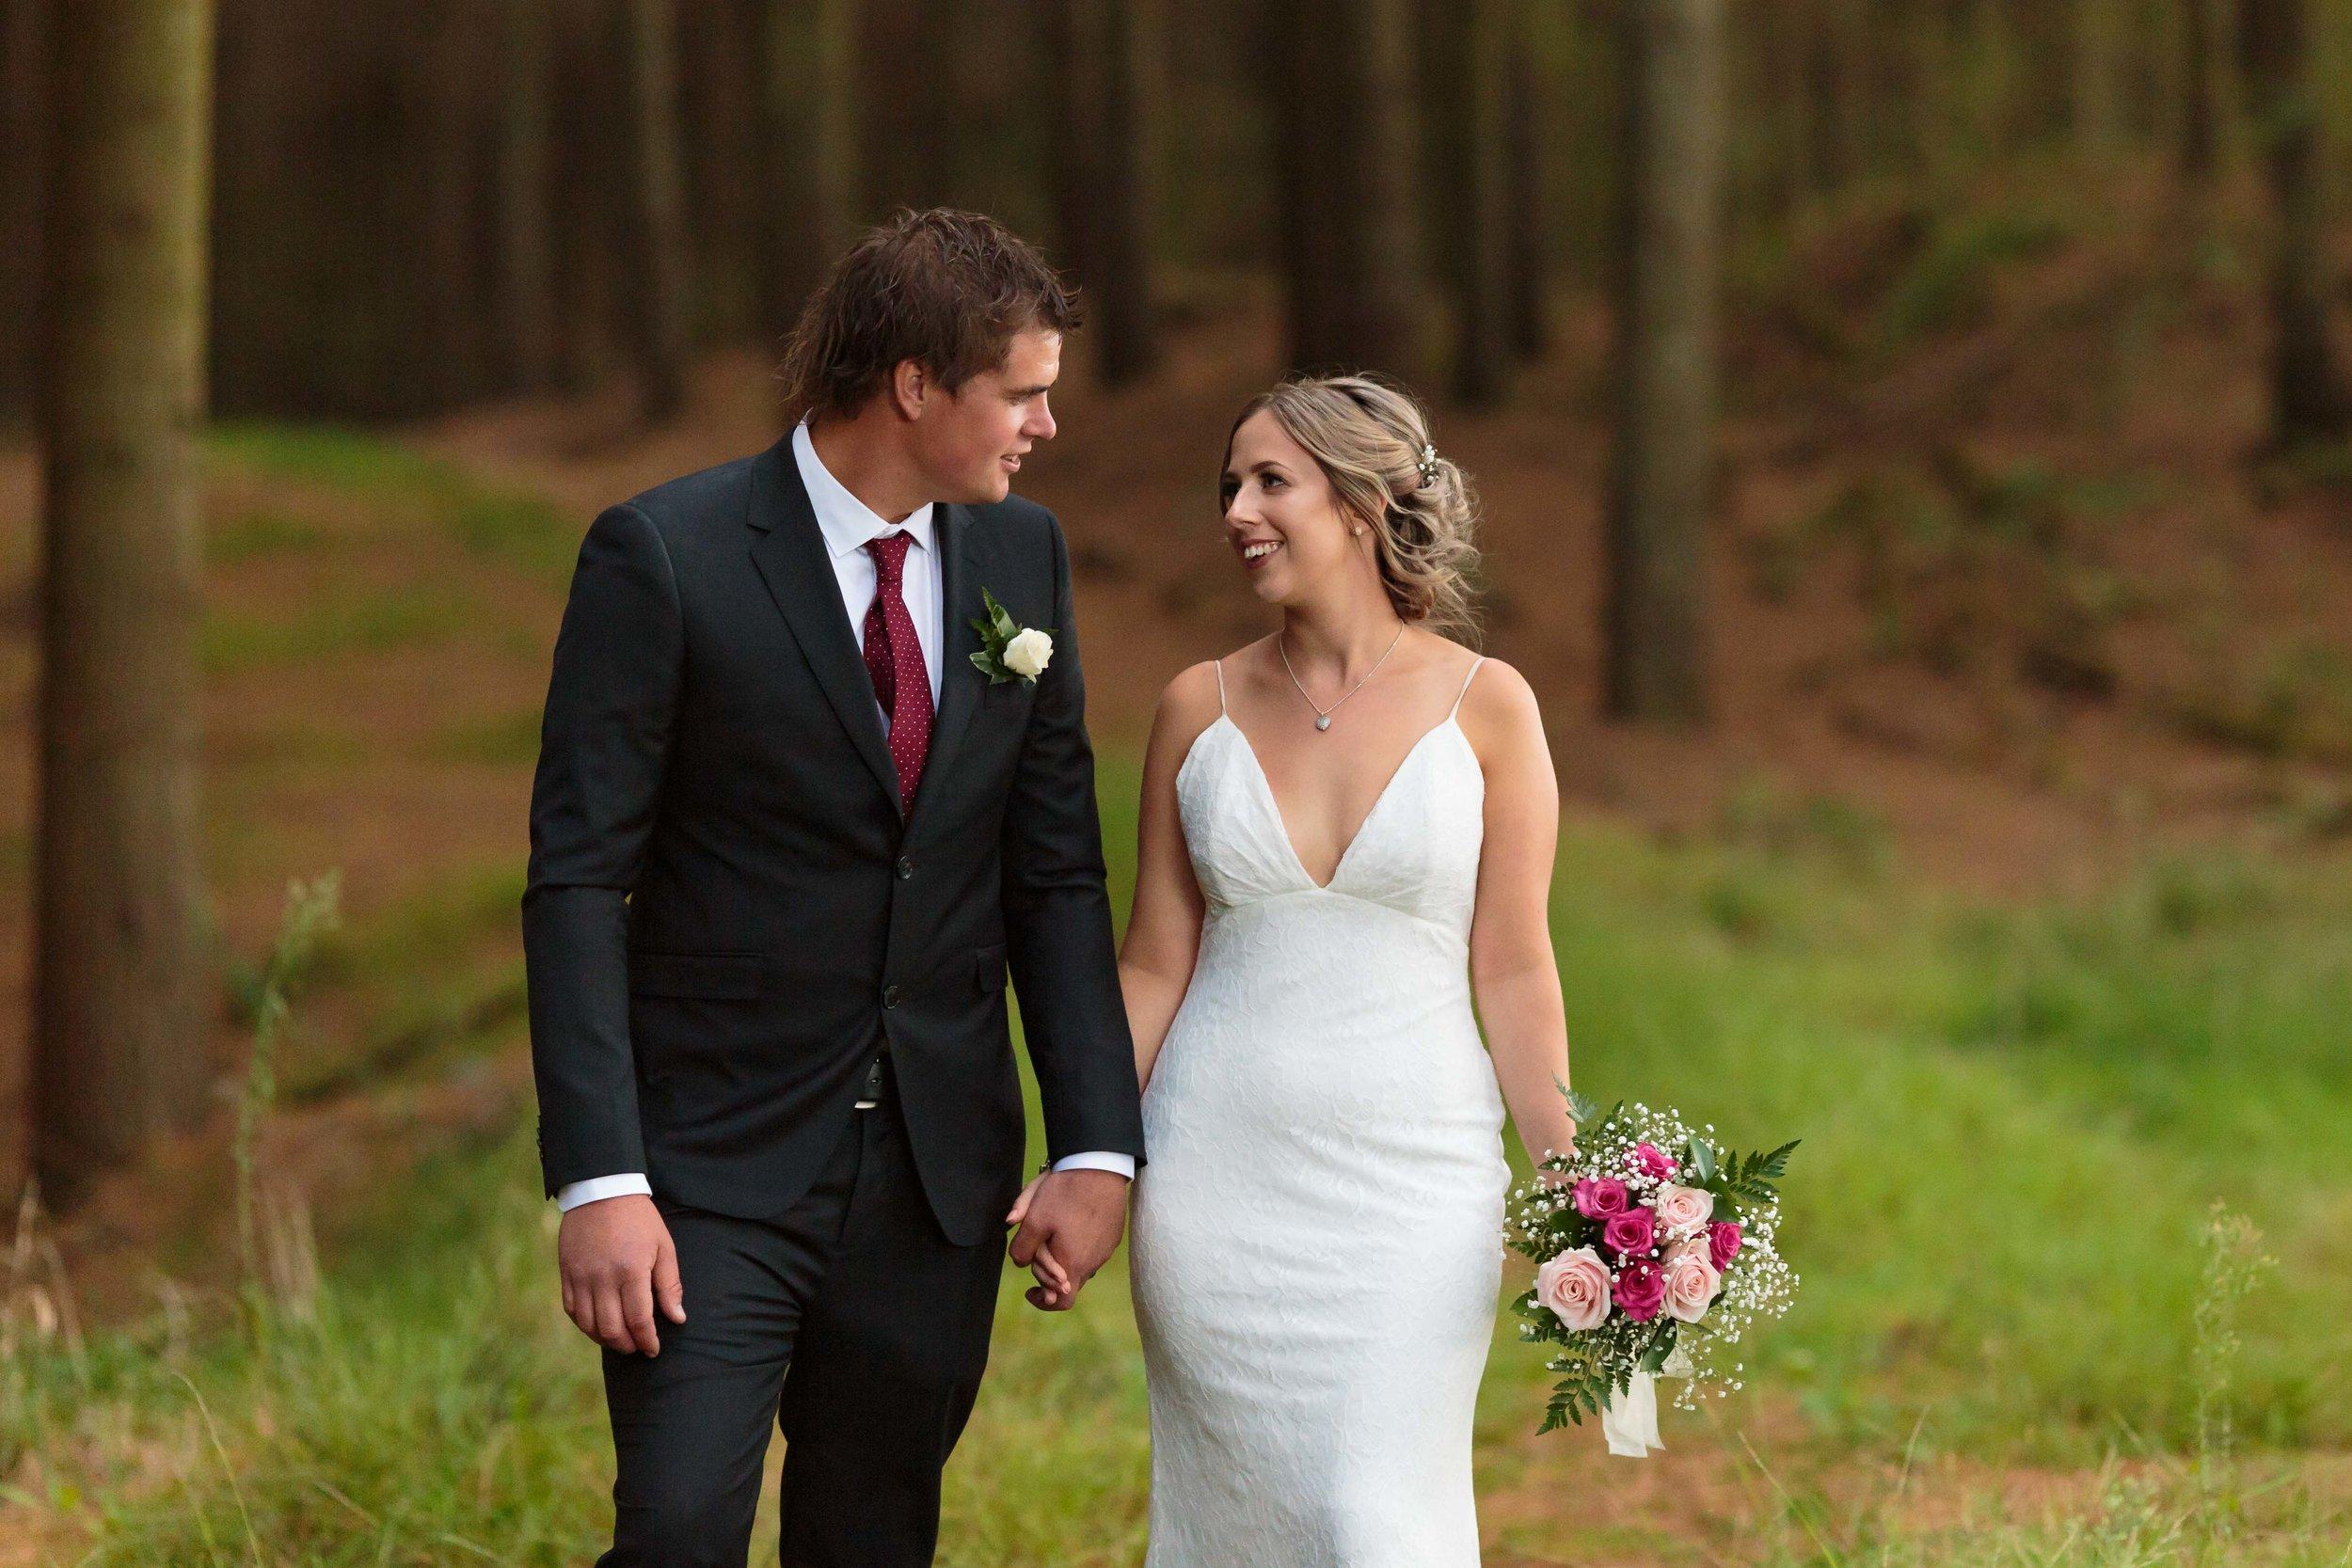 Highight-wedding-photography-dudding-lake-palmerston-north-new-zealand-65.jpg